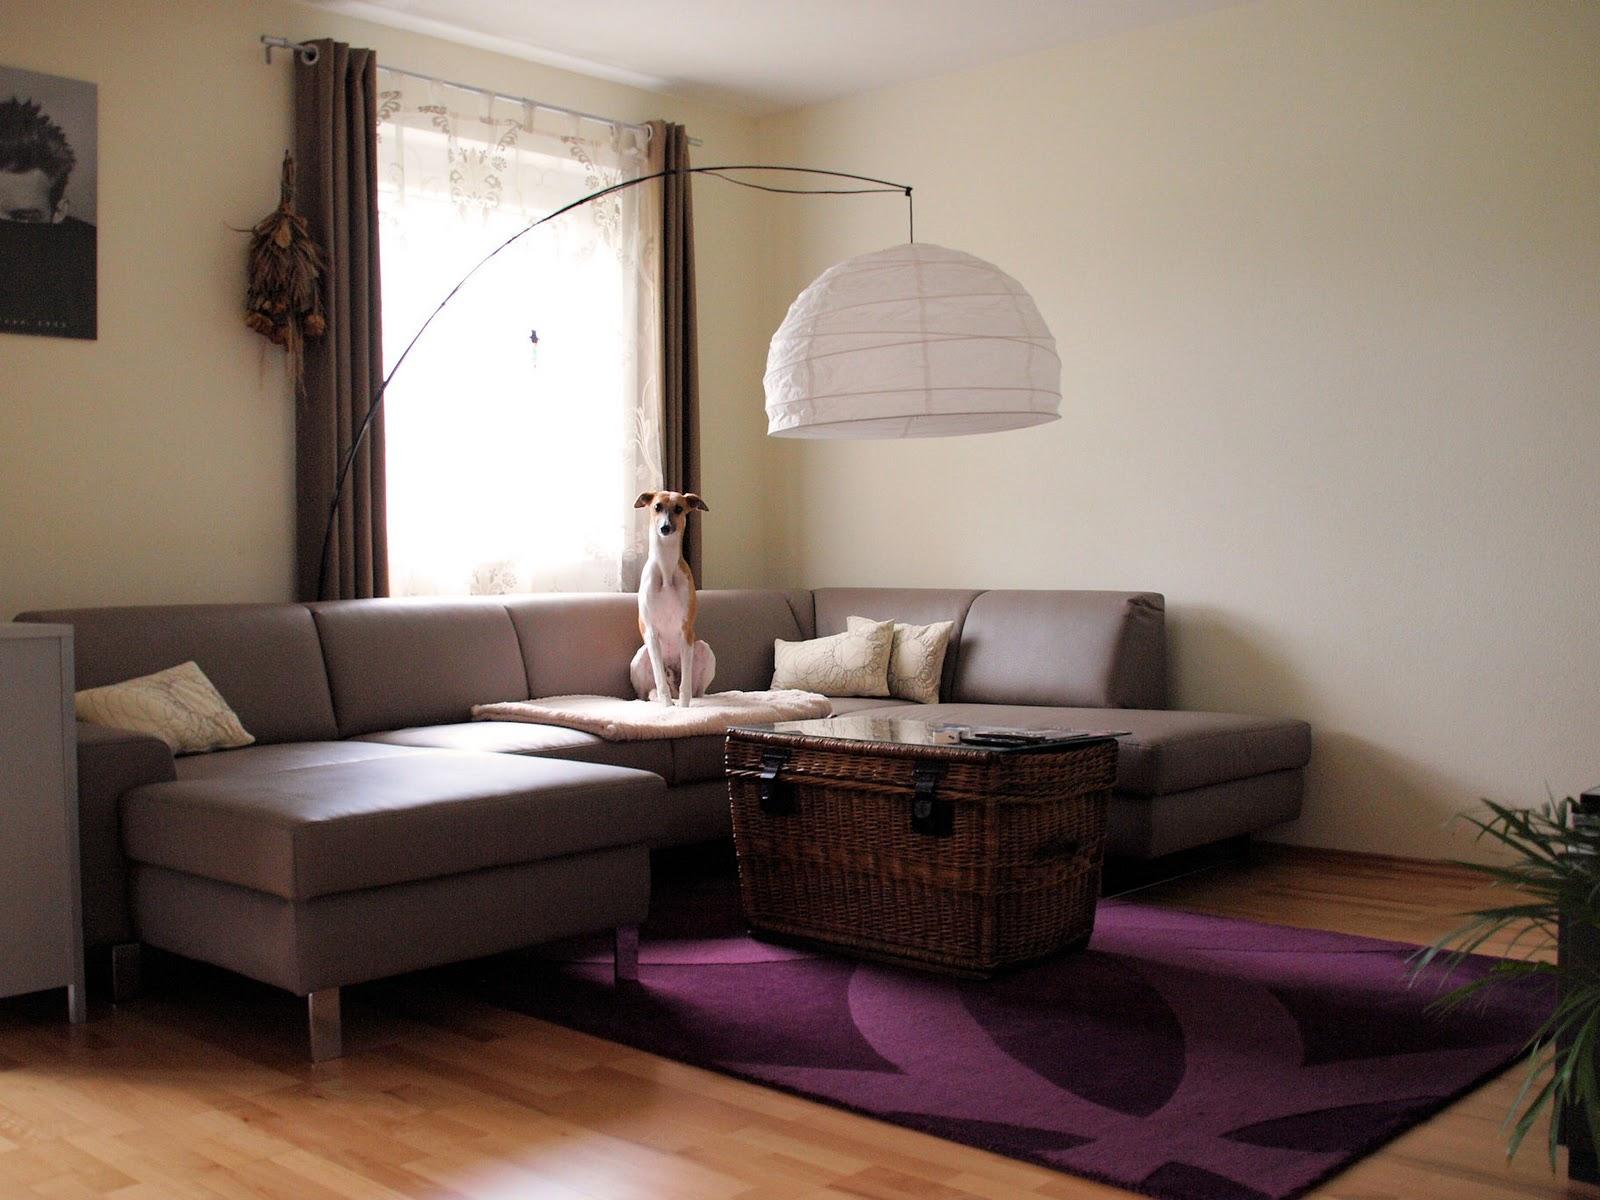 wohnzimmer apricot. Black Bedroom Furniture Sets. Home Design Ideas